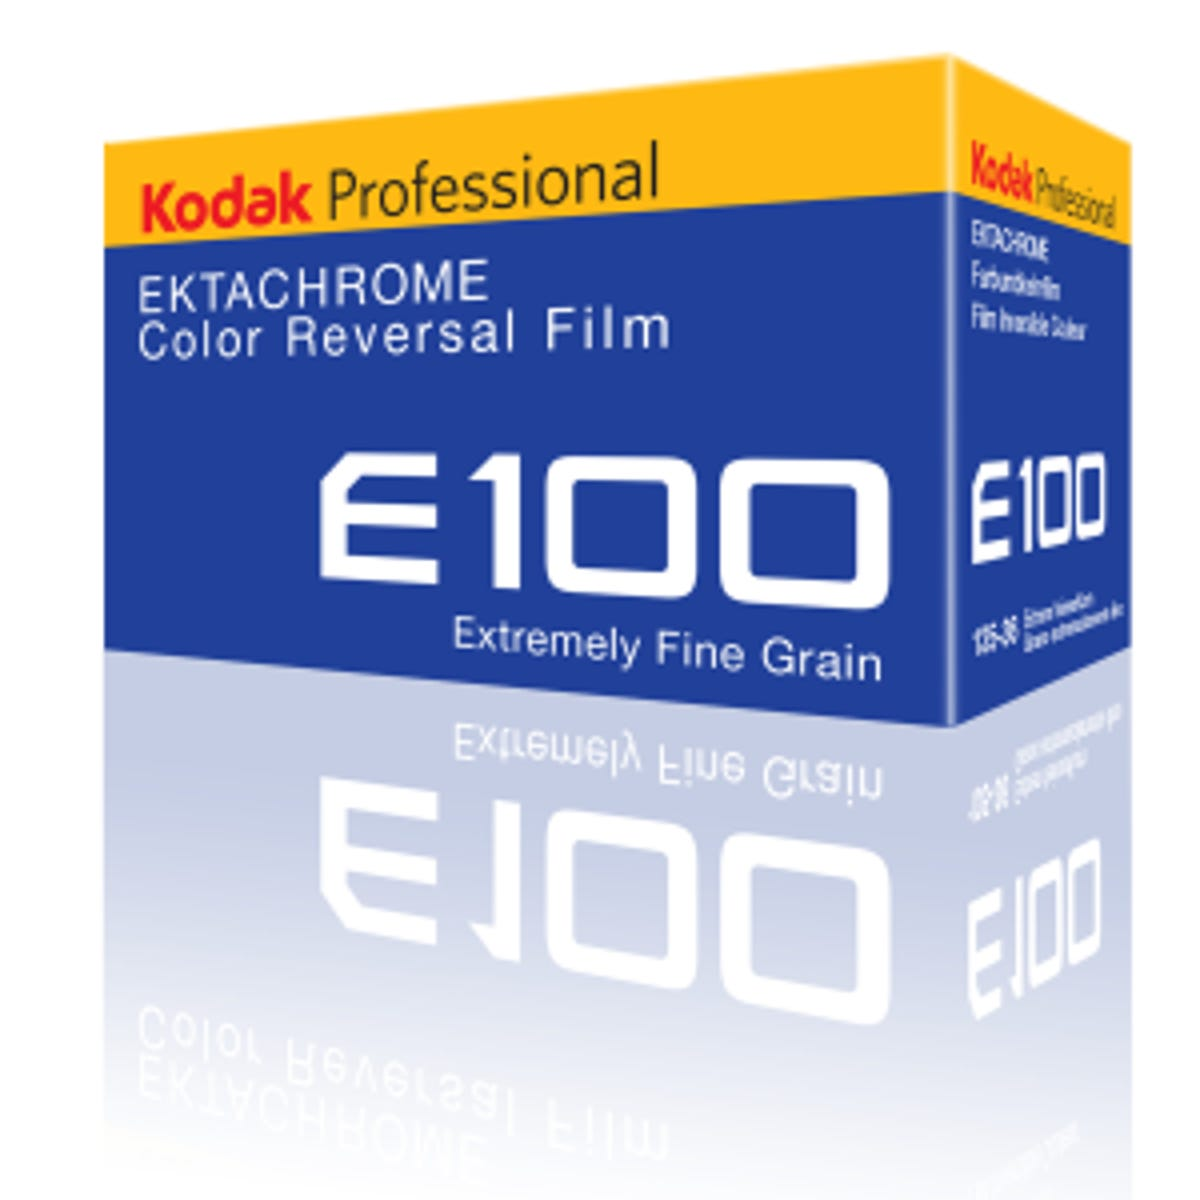 Kodak film business for sale, Kodak Alaris plans to shed